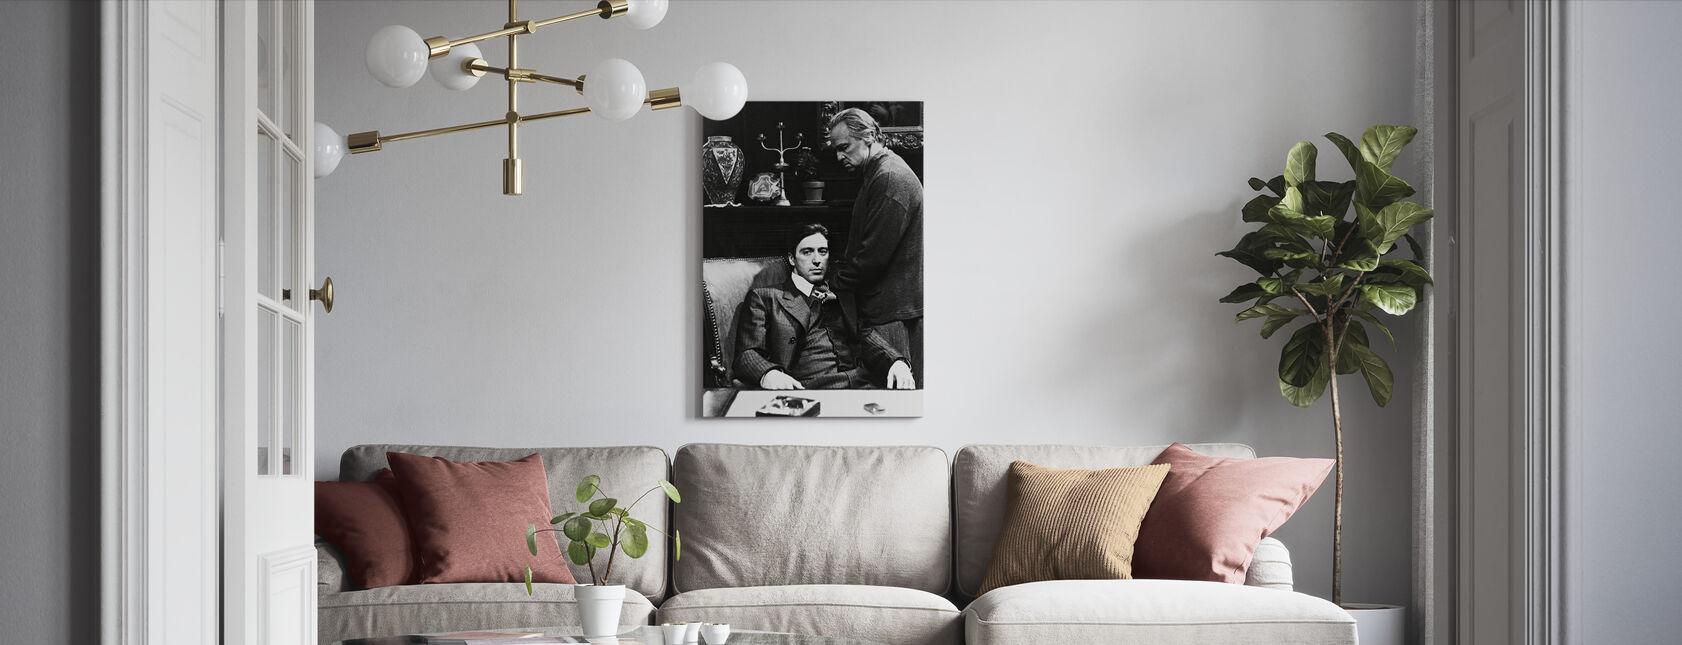 Gudfaren - Al Pacino og Marlon Brando - Lerretsbilde - Stue